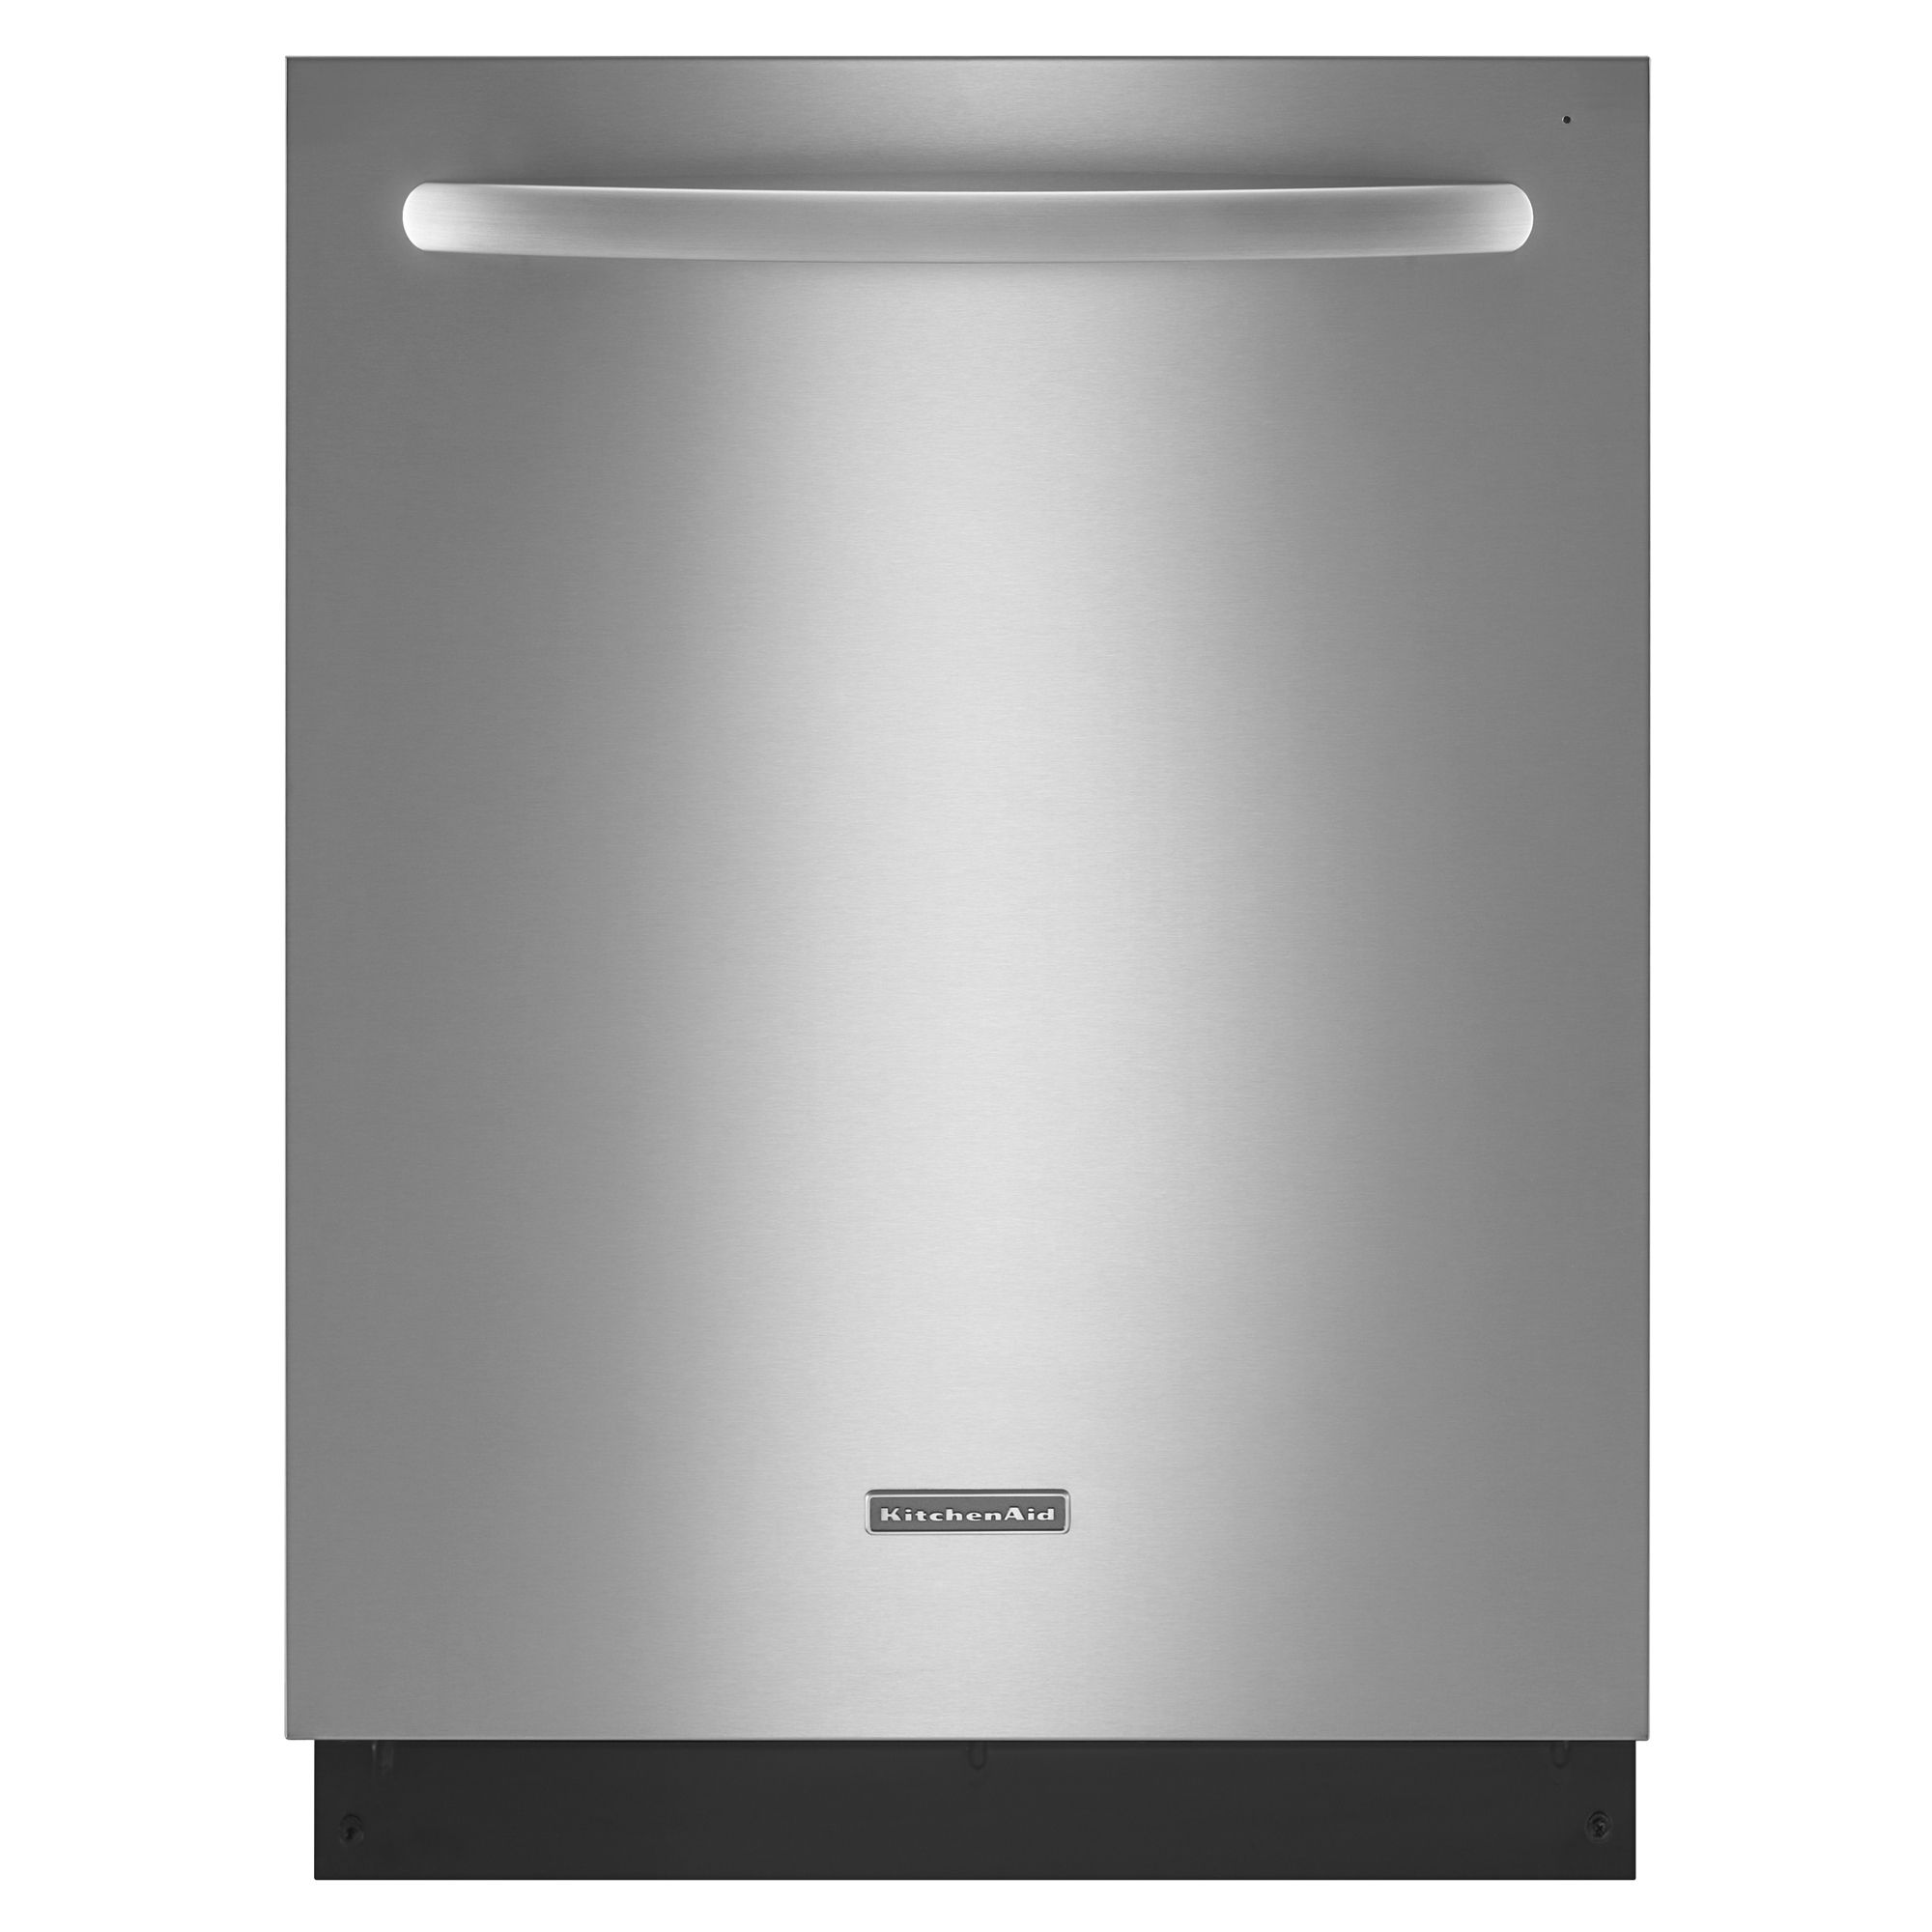 kitchen aide dishwasher shop for appliances kitchenaid kude70fxss 24 quot superba eq built in